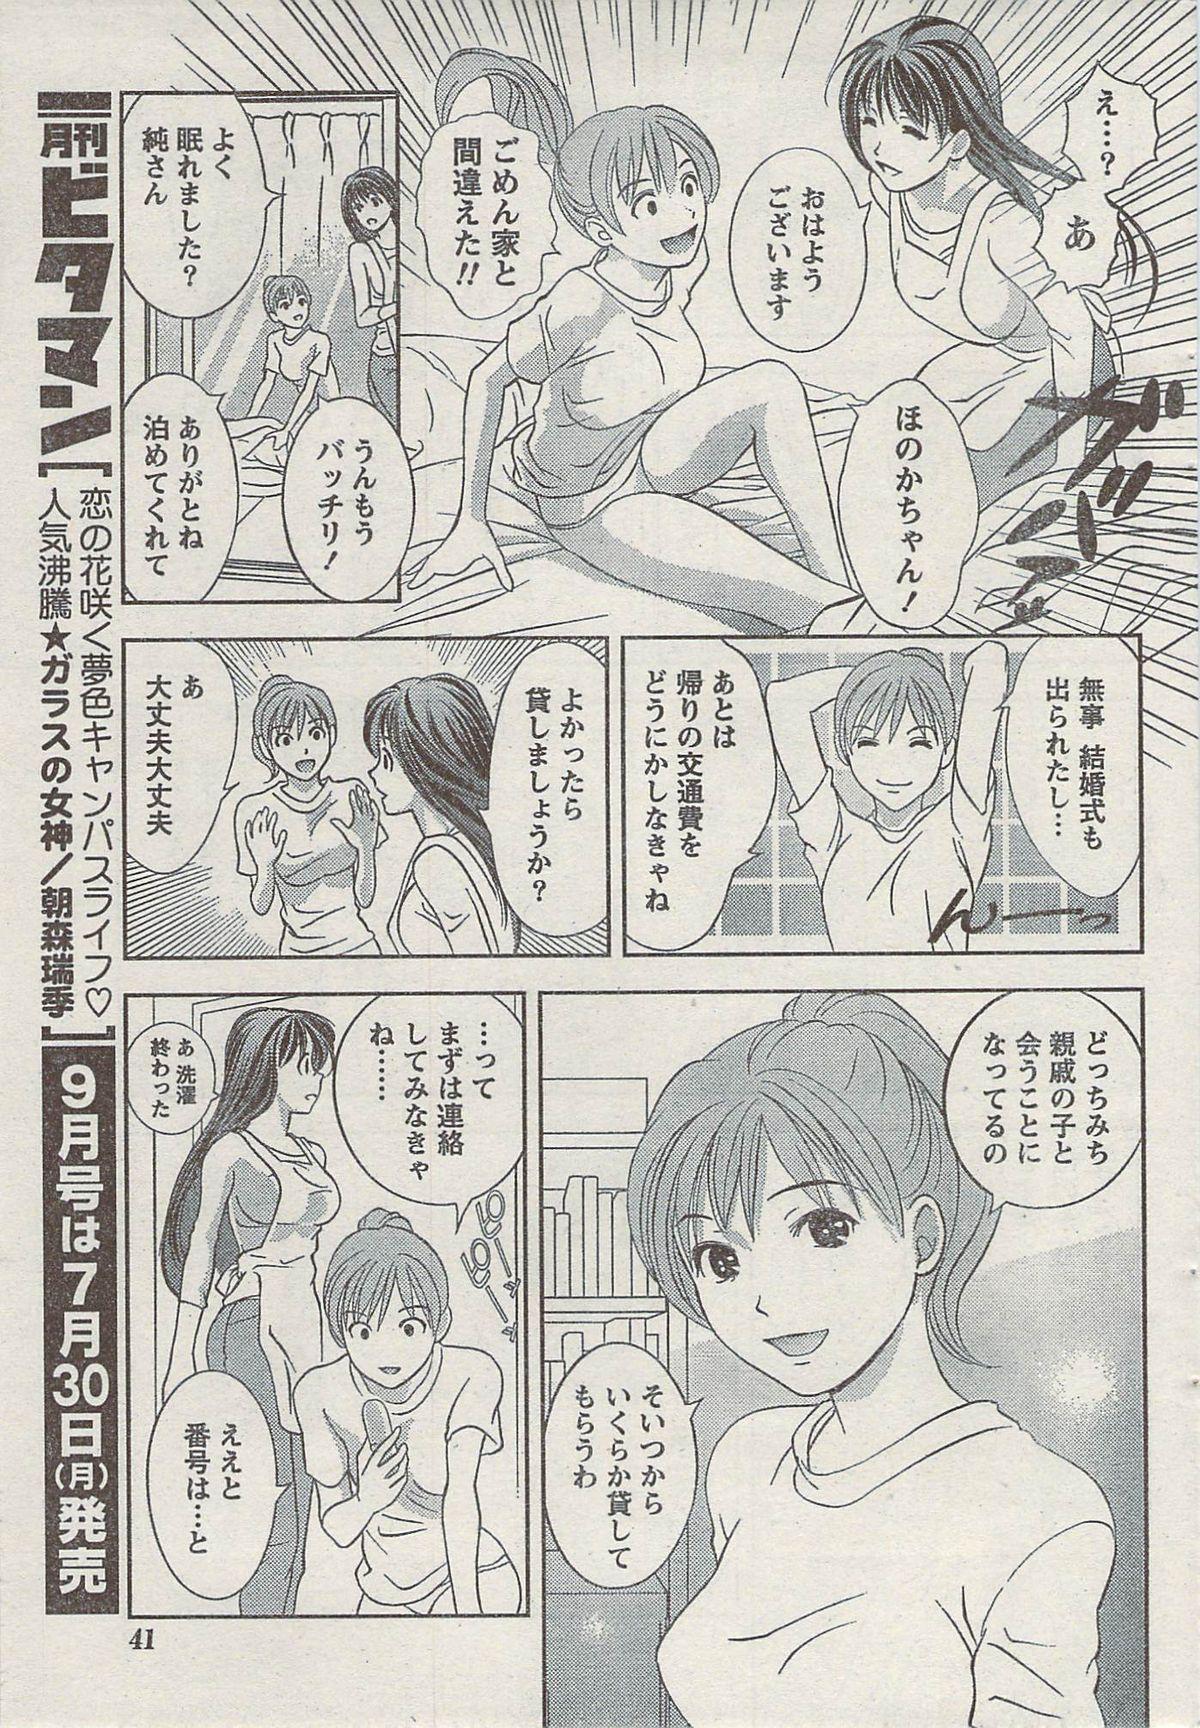 Monthly Vitaman 2007-08 40